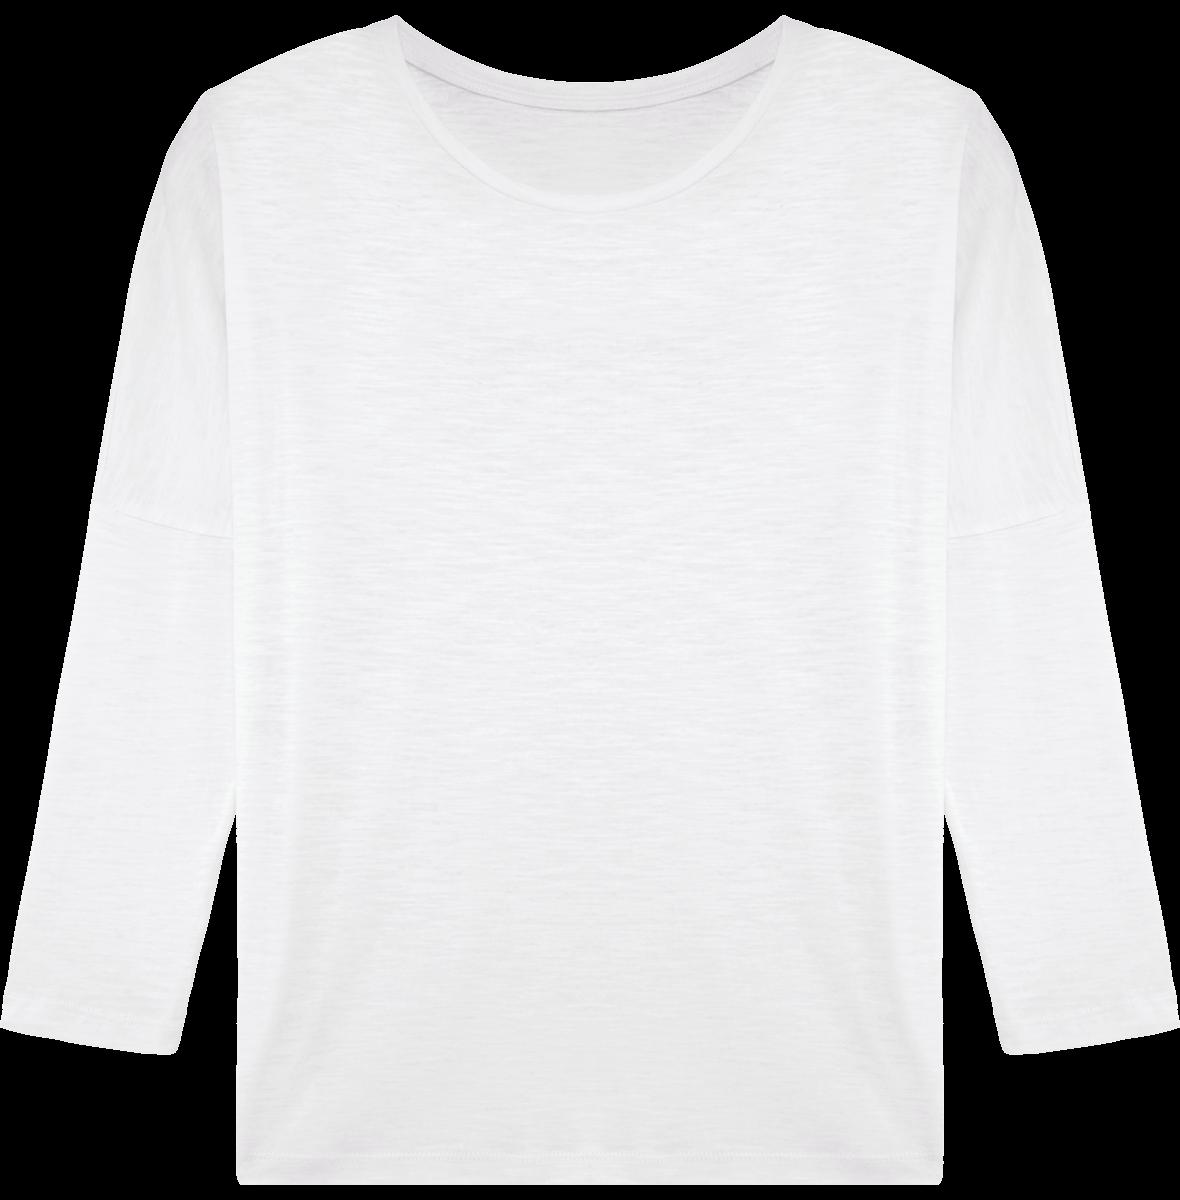 cb54e8ae6a8ae T-shirt pour femme dès 6.00€. 5 couleurs